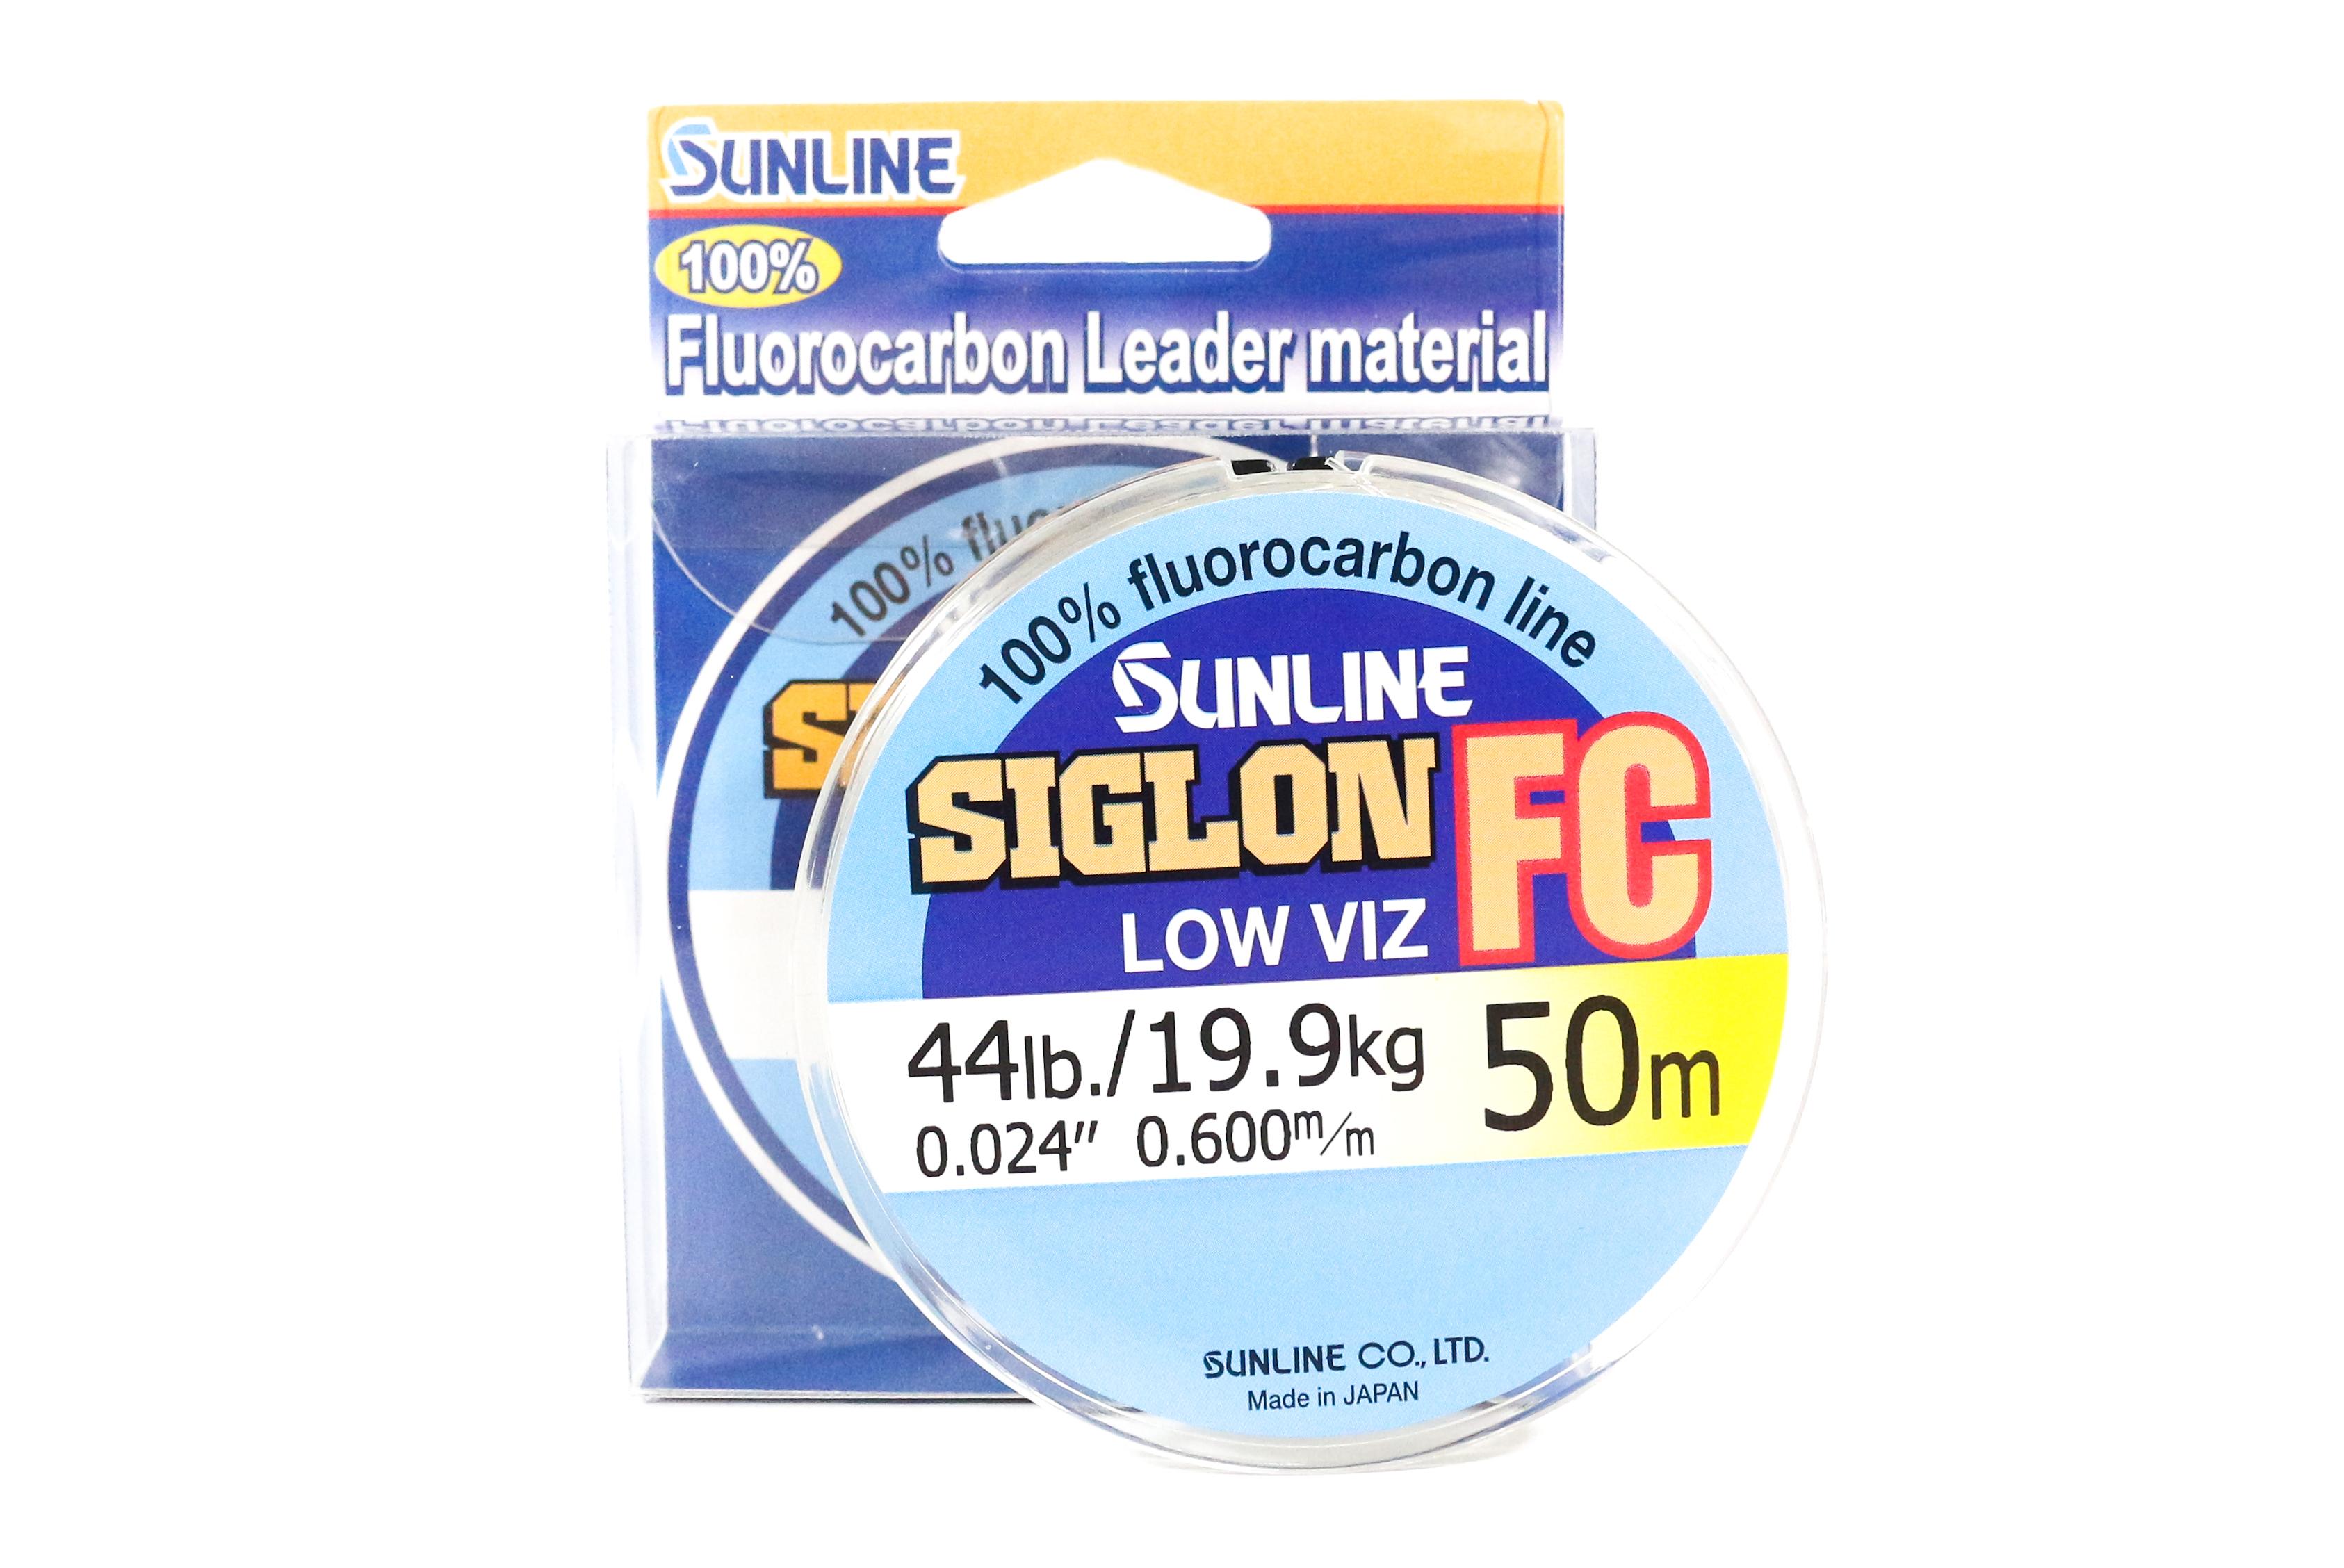 Sunline Siglon FC Fluorocarbon Line 50m 44lb Diameter 0.6 mm (5952)